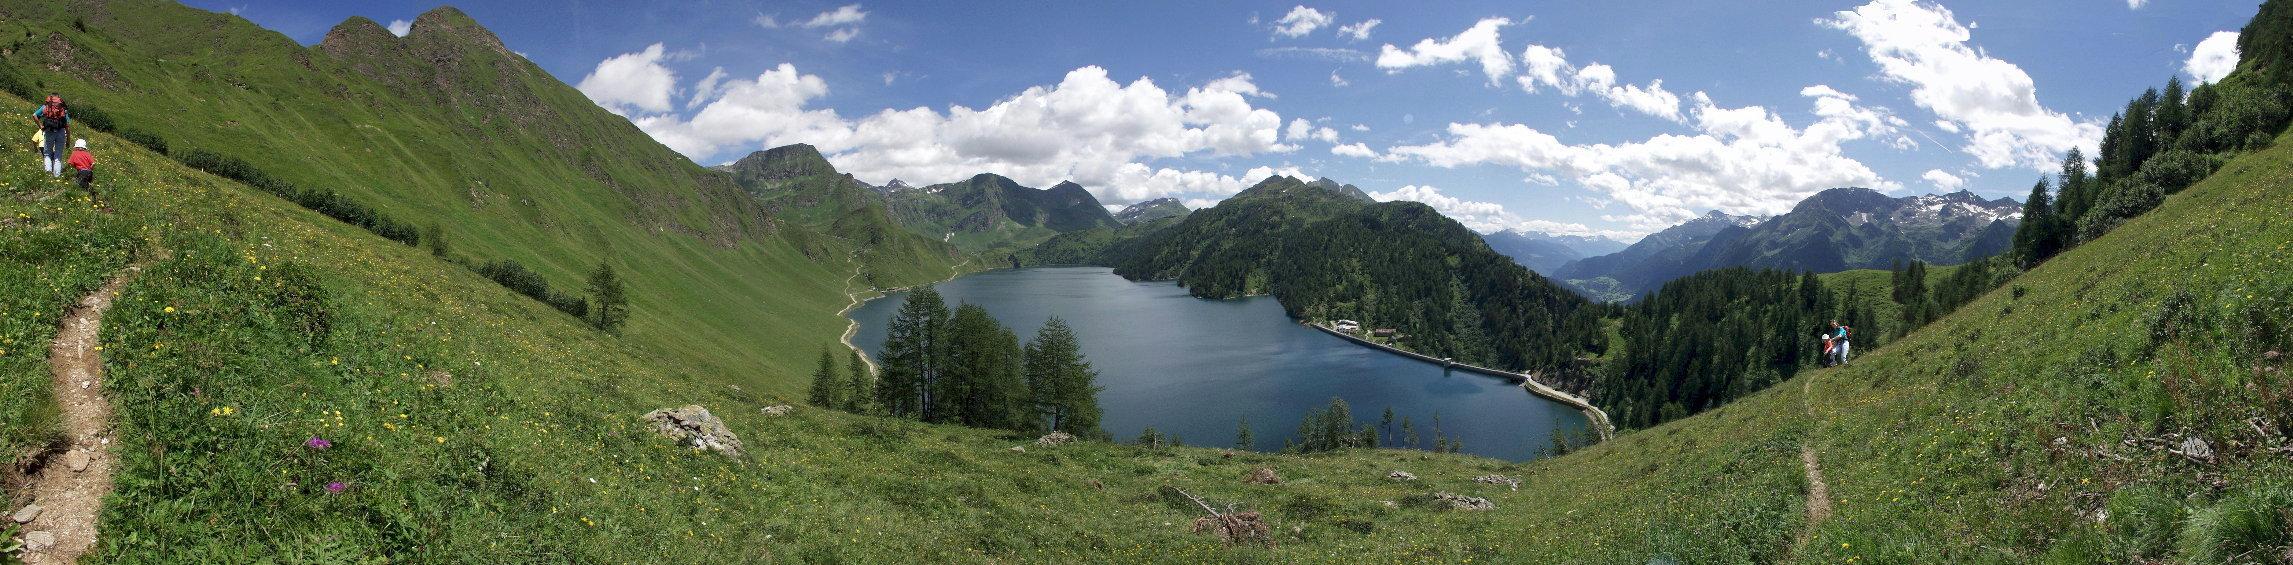 Lago Ritom (Tessin)